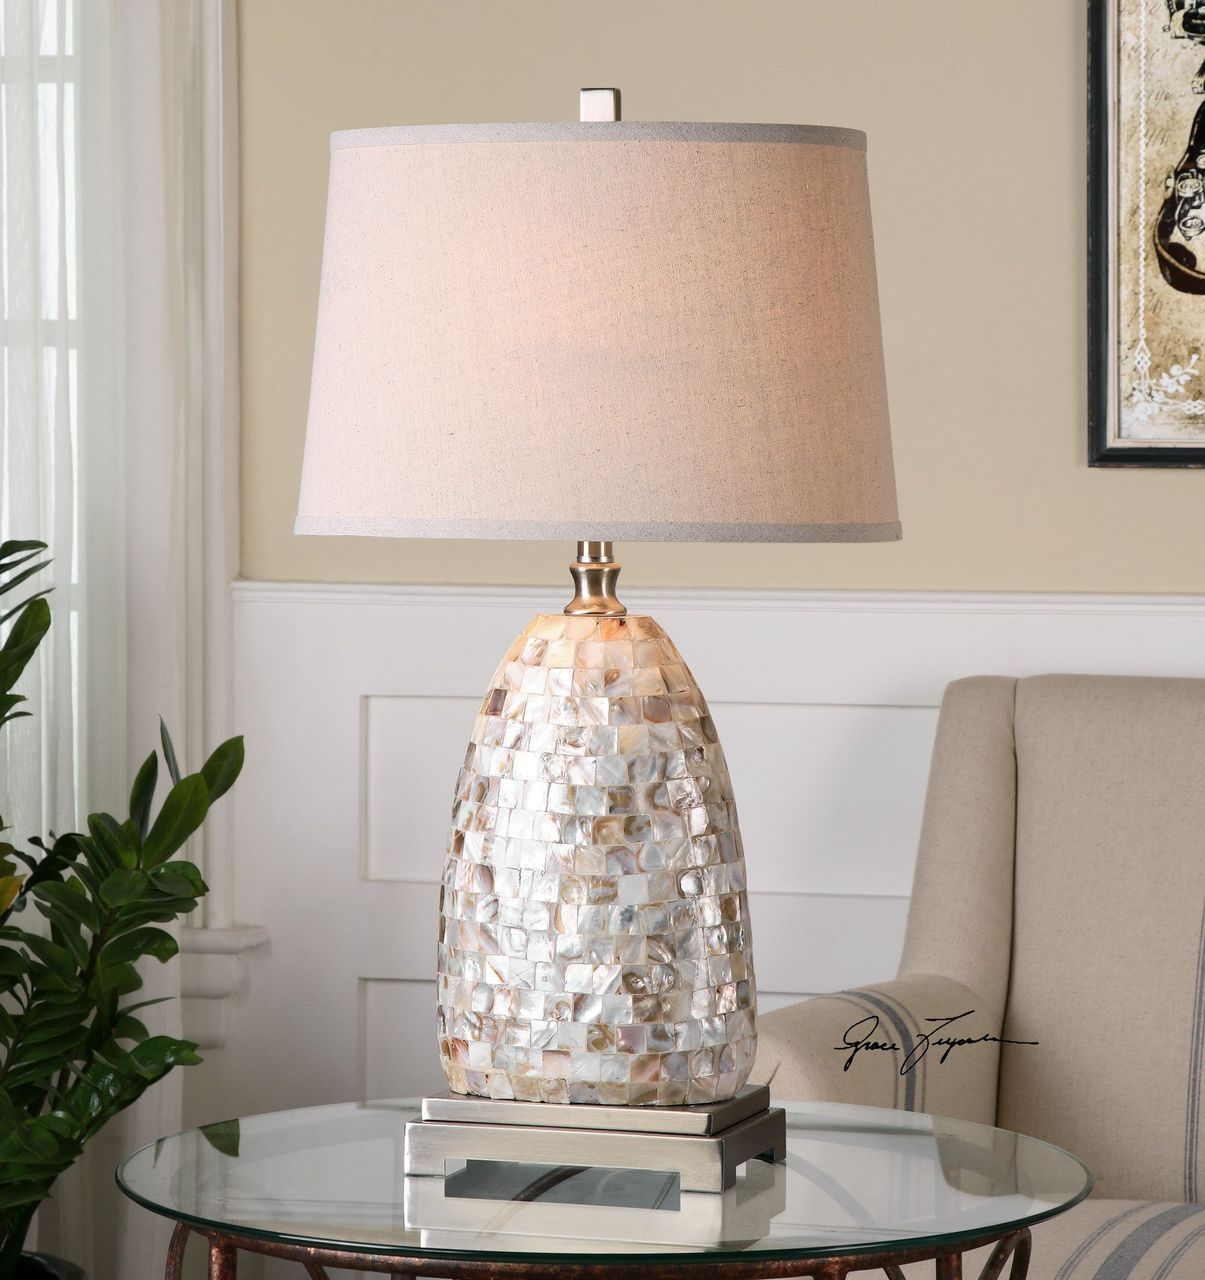 Capurso Capiz Shell Table Lamp Lamp Table Lamp Tall Table Lamps